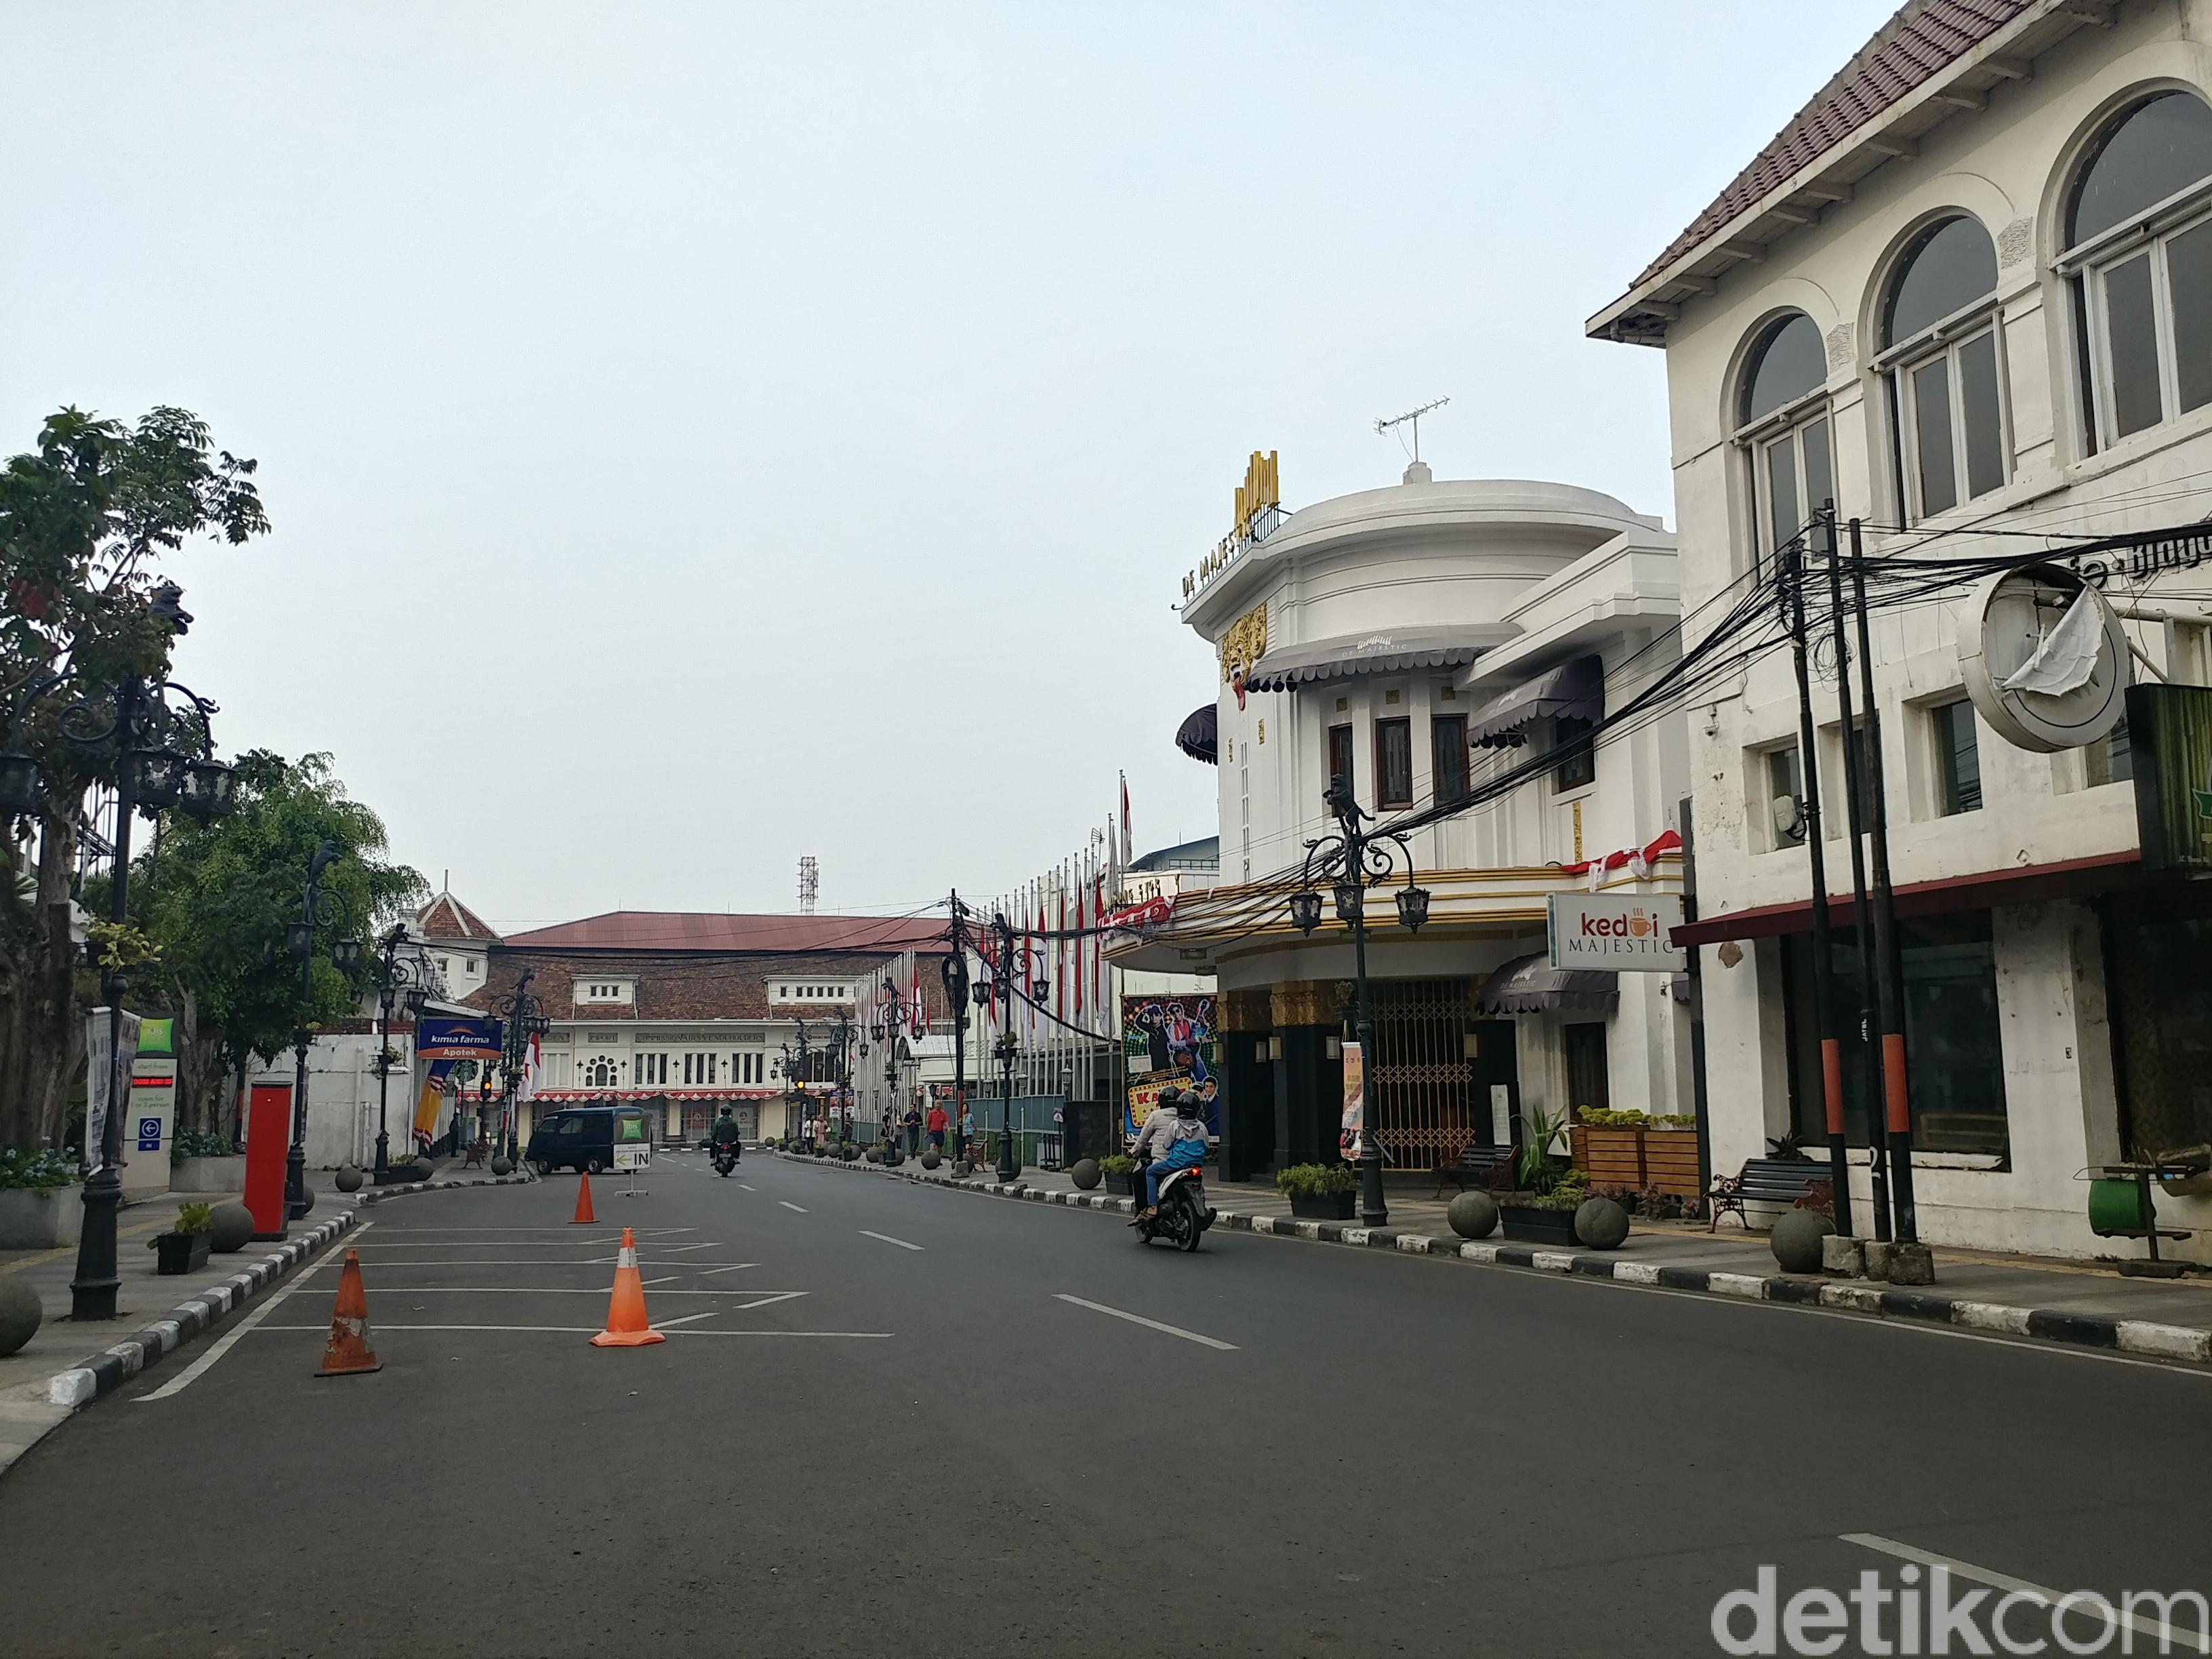 Libur Idul Adha Pagi Lintas Bandung Lengang Sepi Jalan Braga